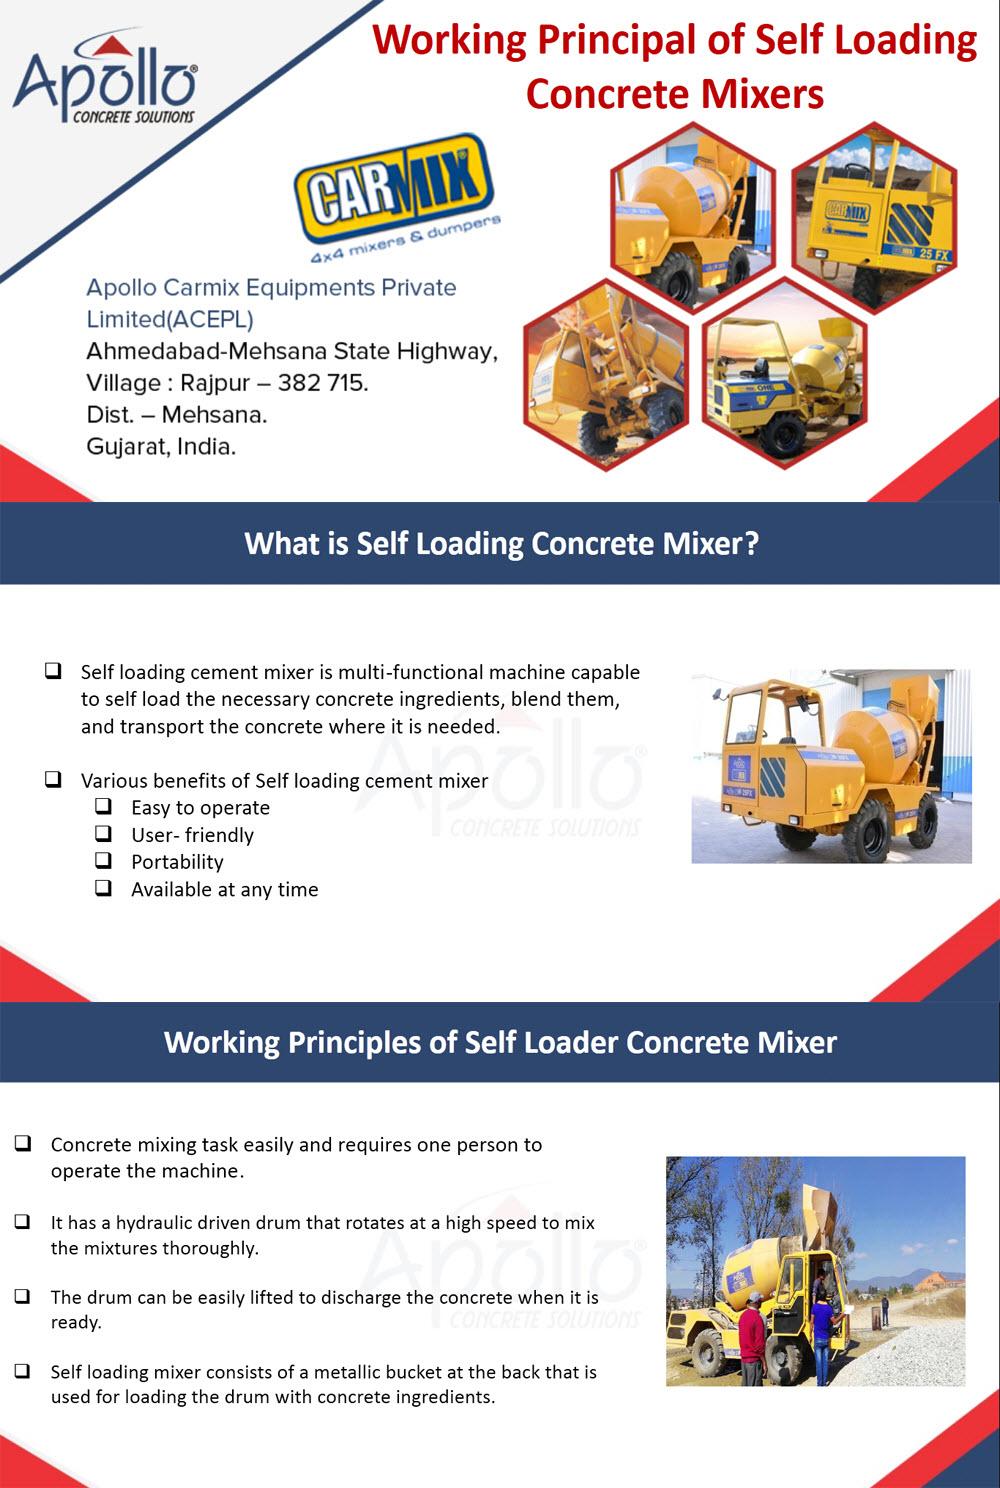 Working Principal of Self Loading Concrete Mixers